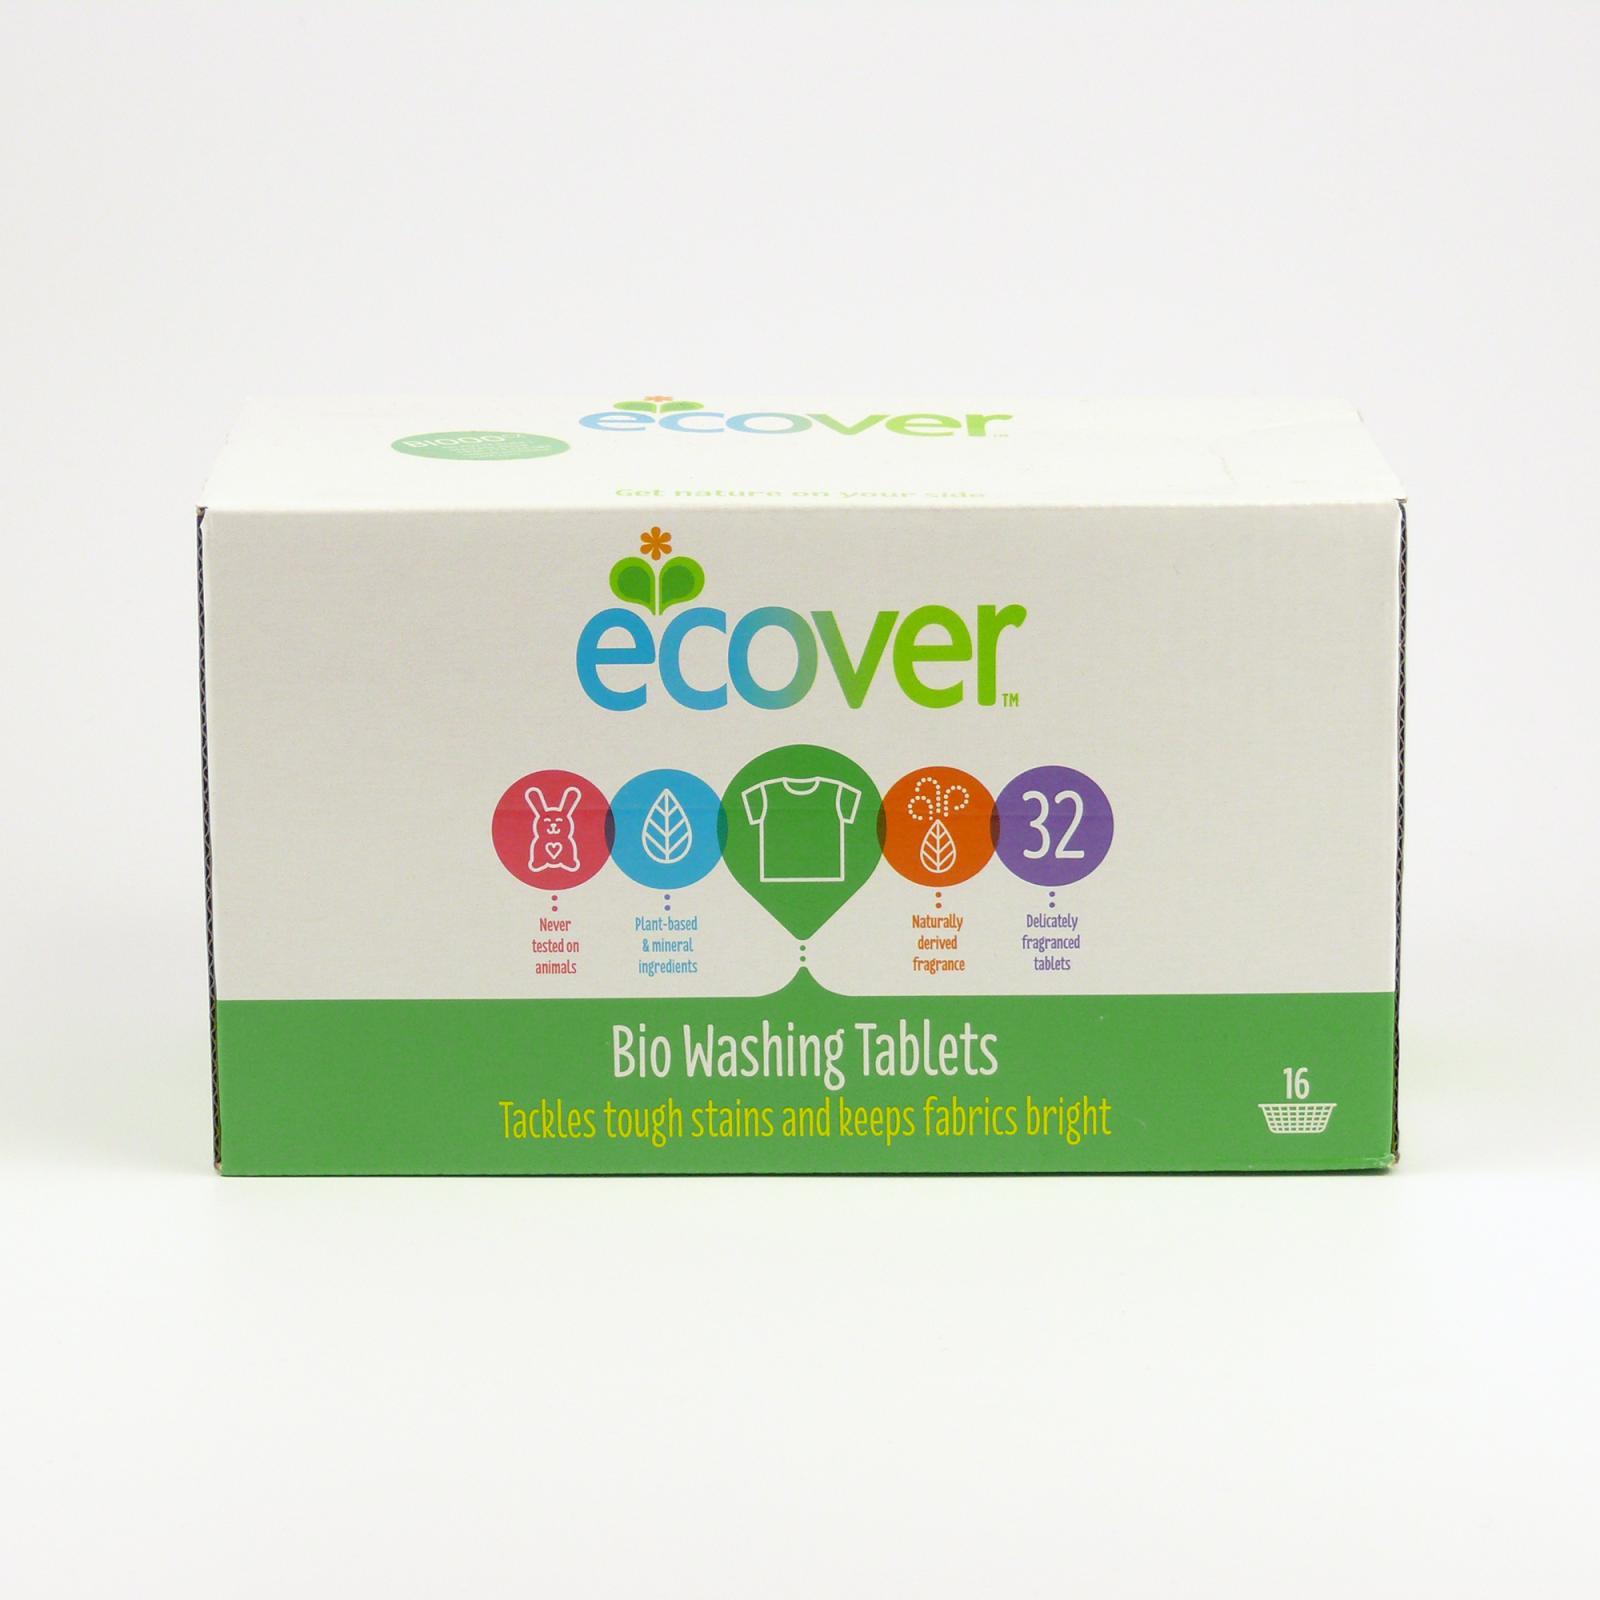 Ecover Tablety na praní 32 tablet, 960 g